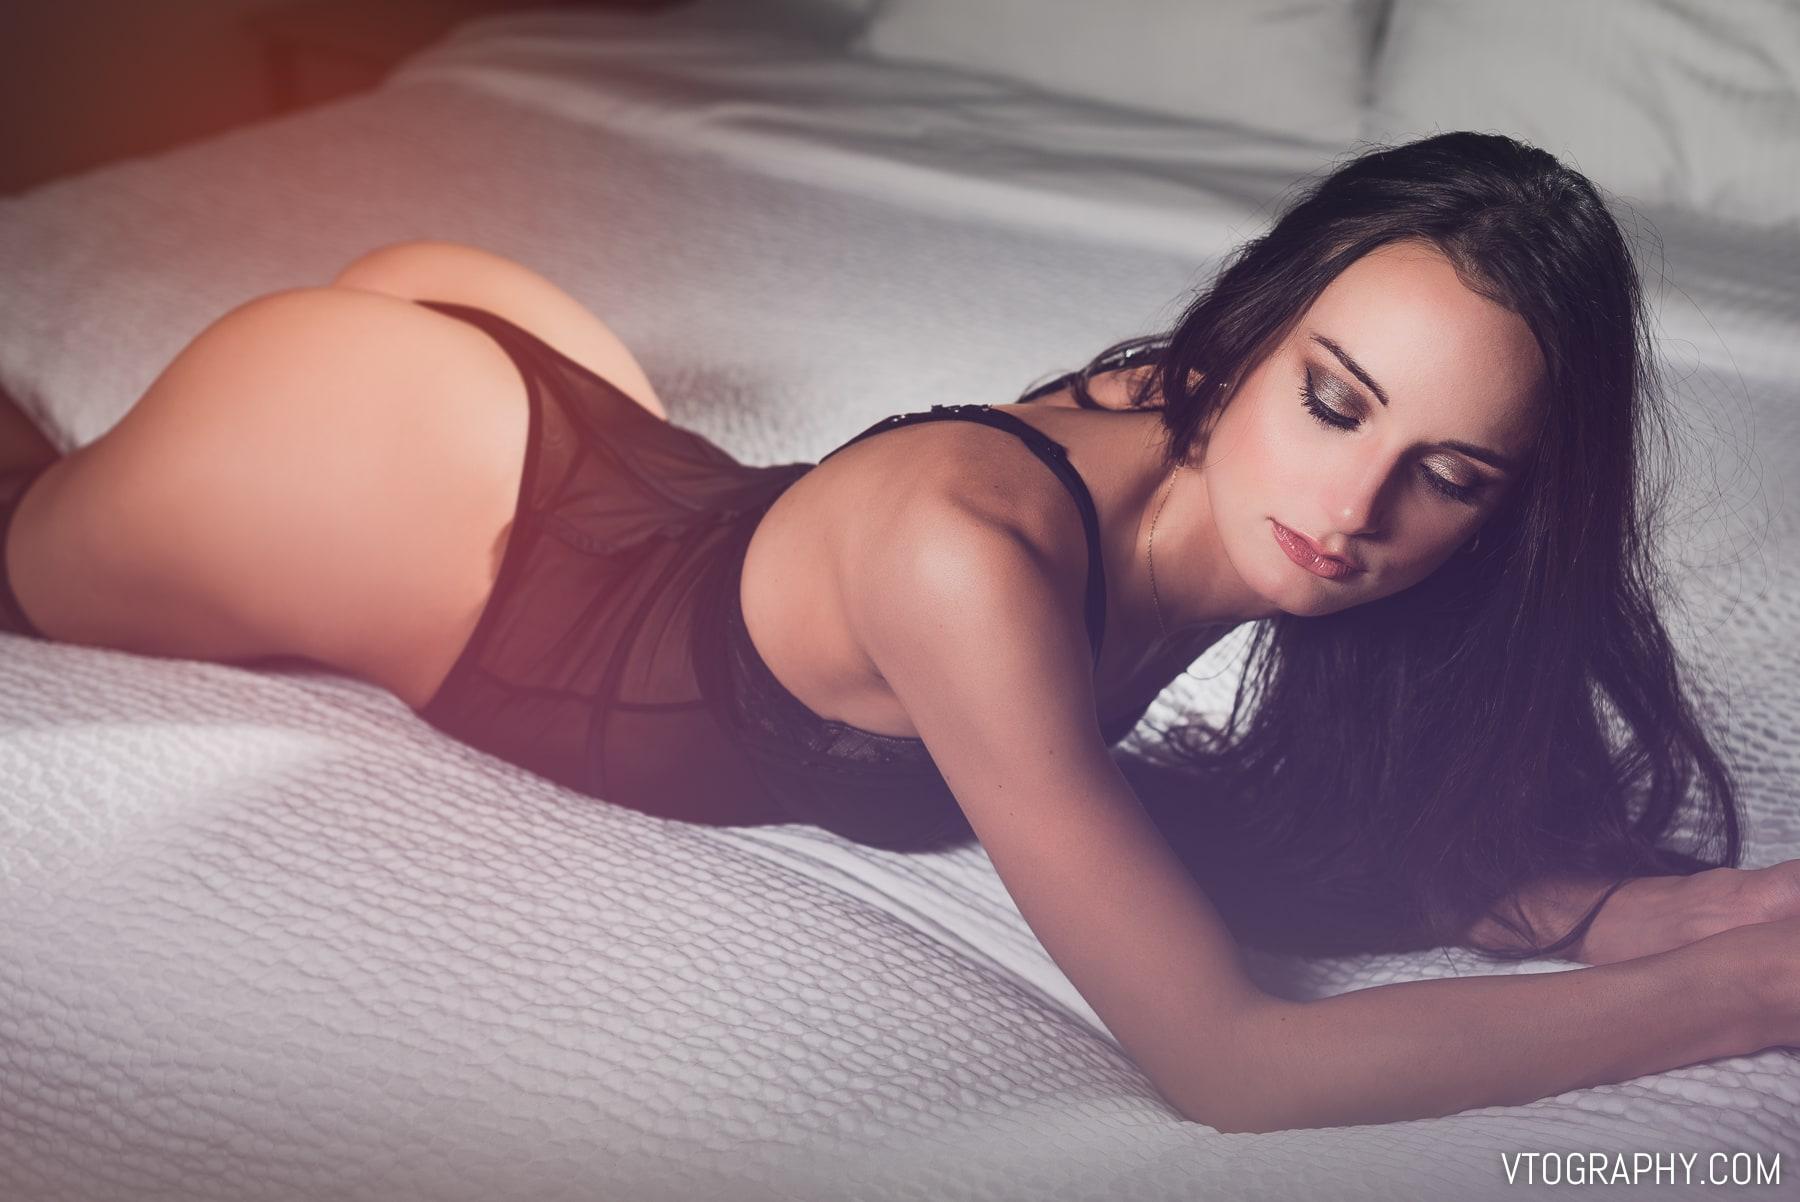 Model Ashton Sullivan of City Models, Halifax